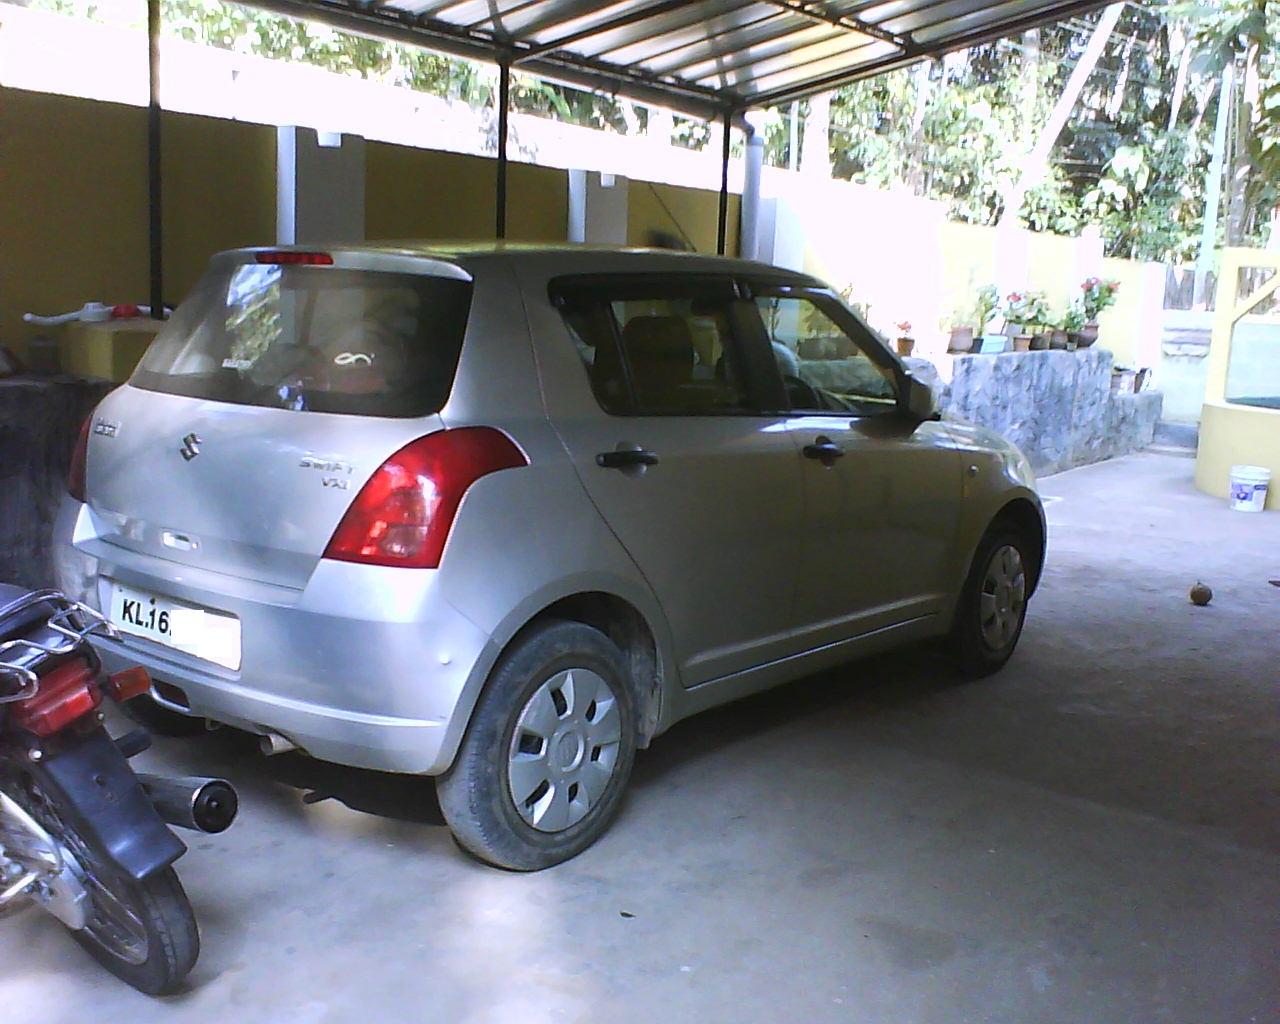 2006 Maruti Swift Vxi Used Cars Trivandrum